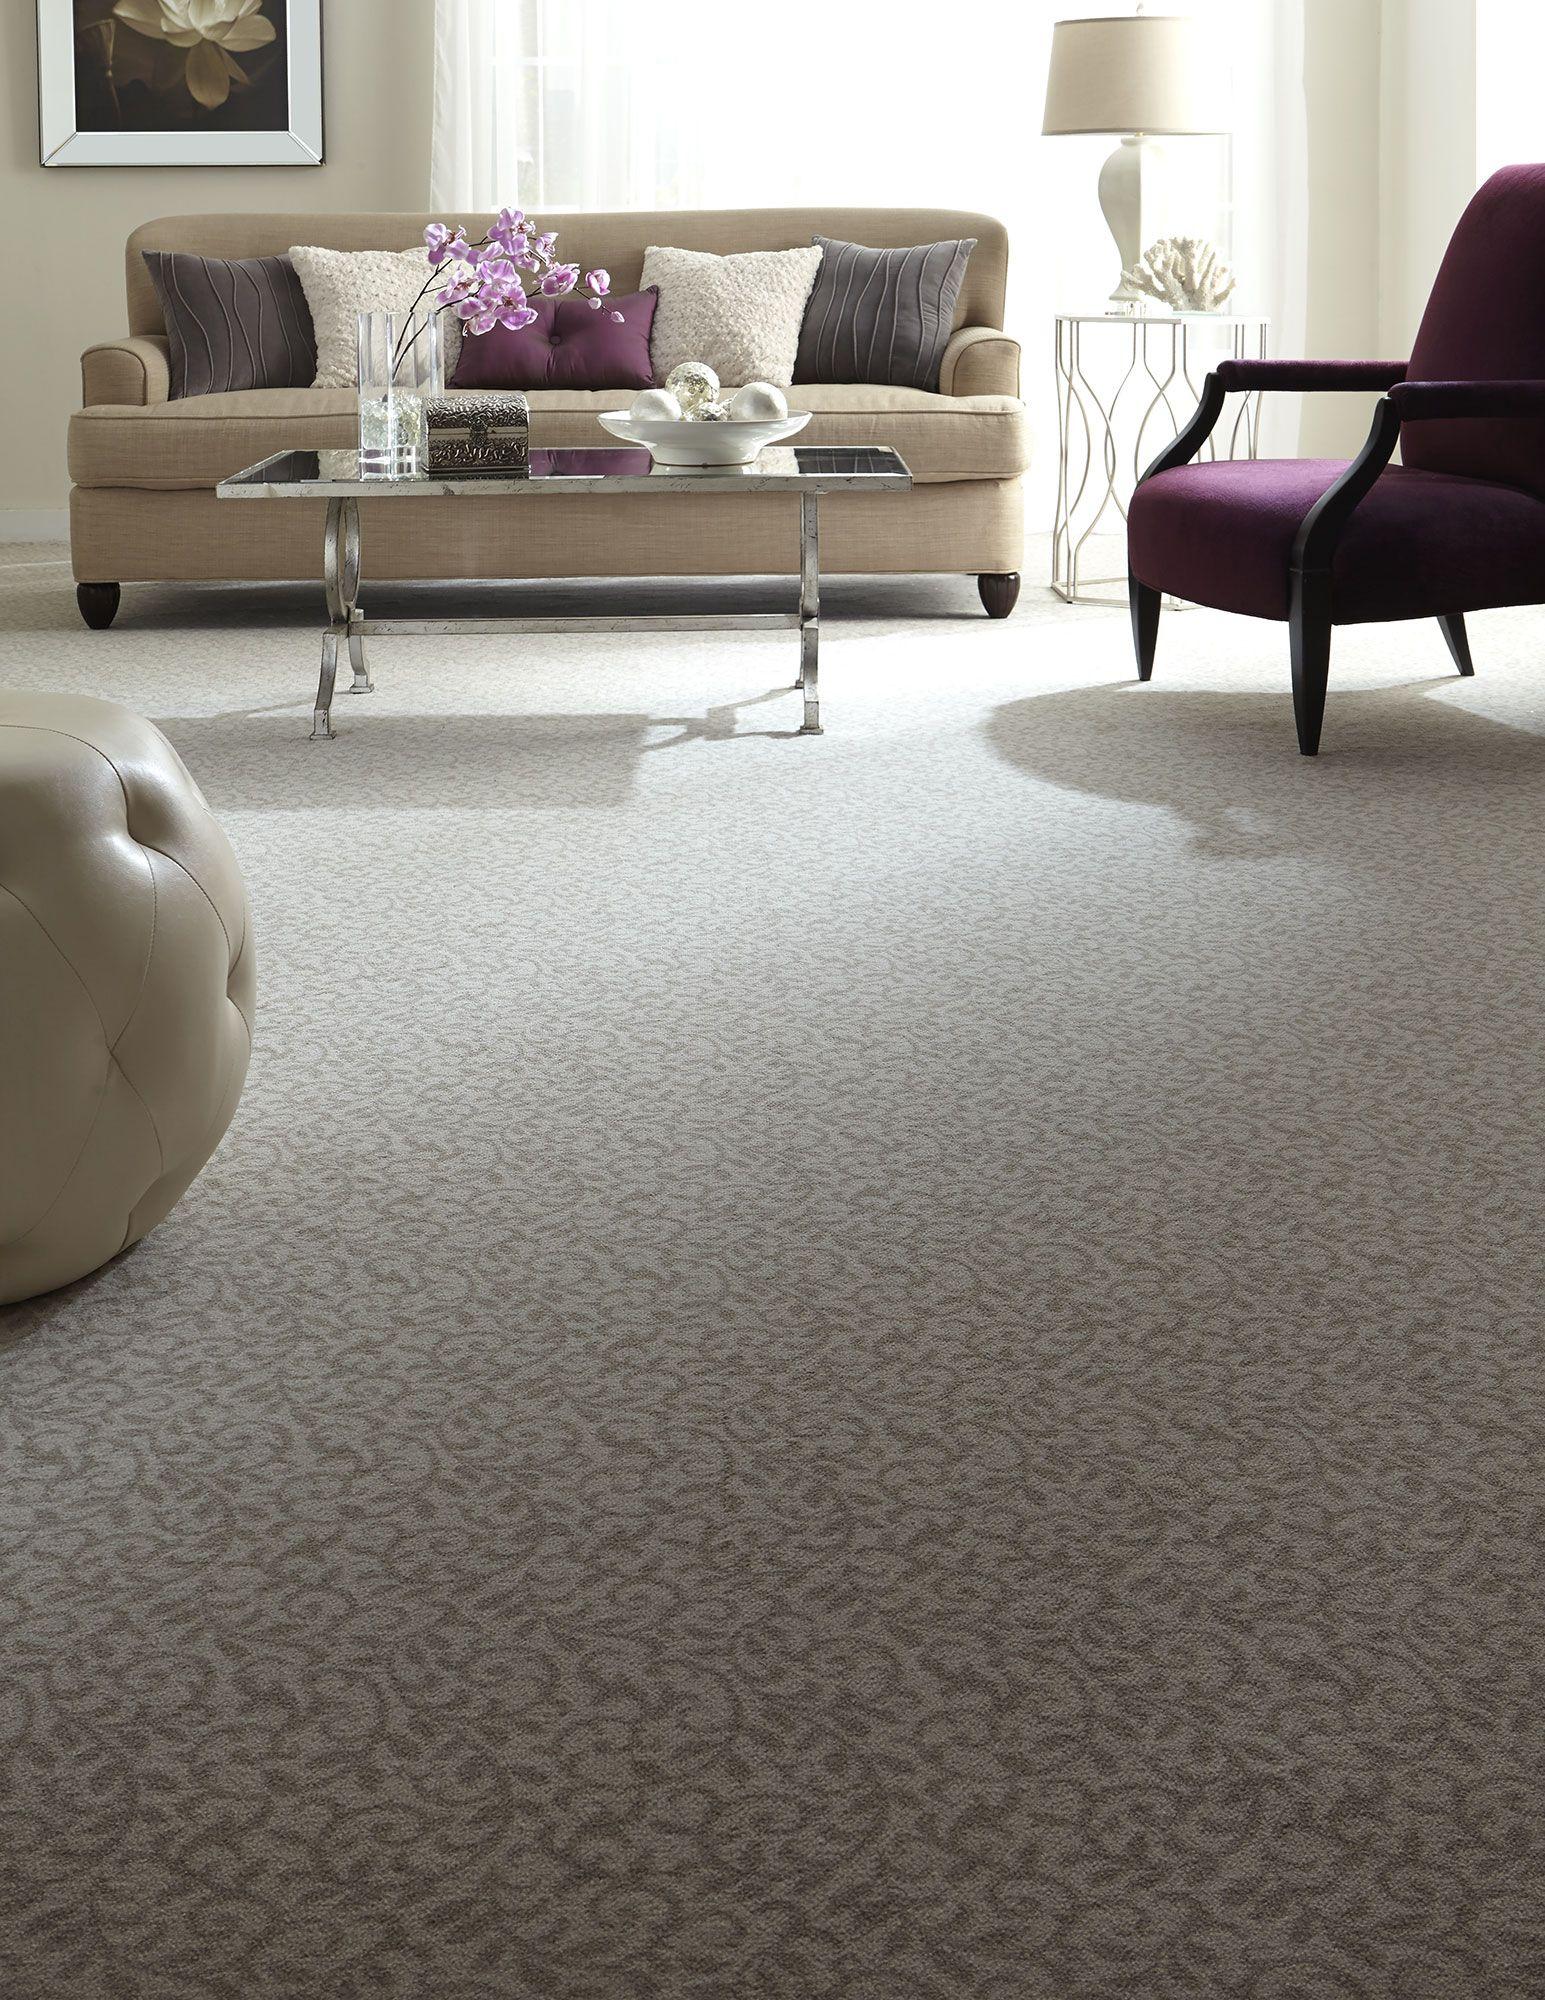 vine patterned carpet | neutral flooring | living room ideas